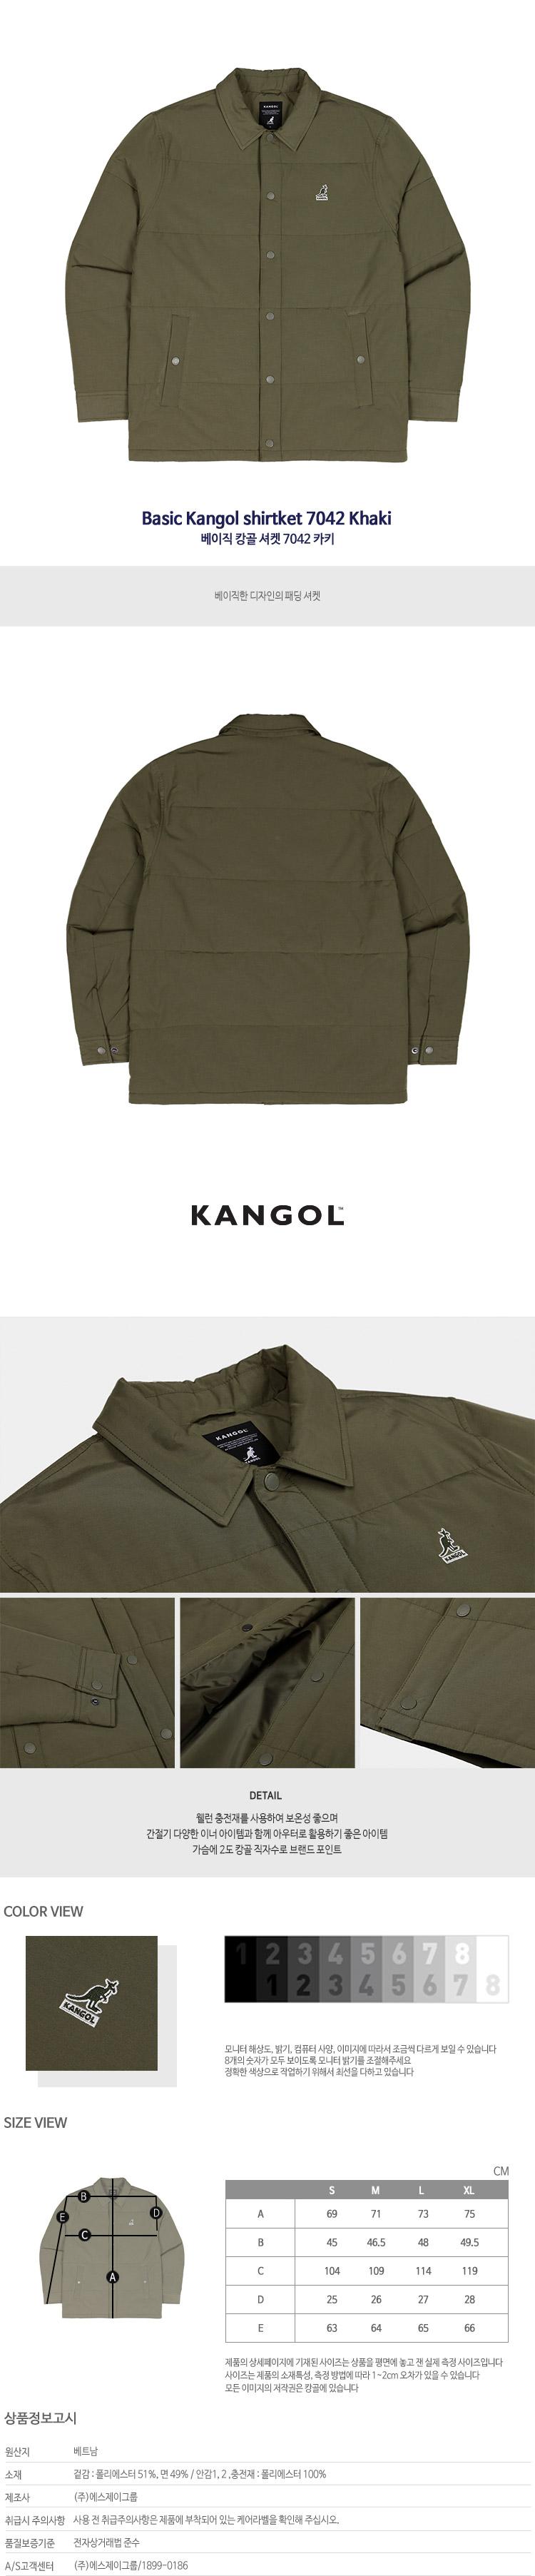 Basic Kangol shirtket 7042 KHAKI